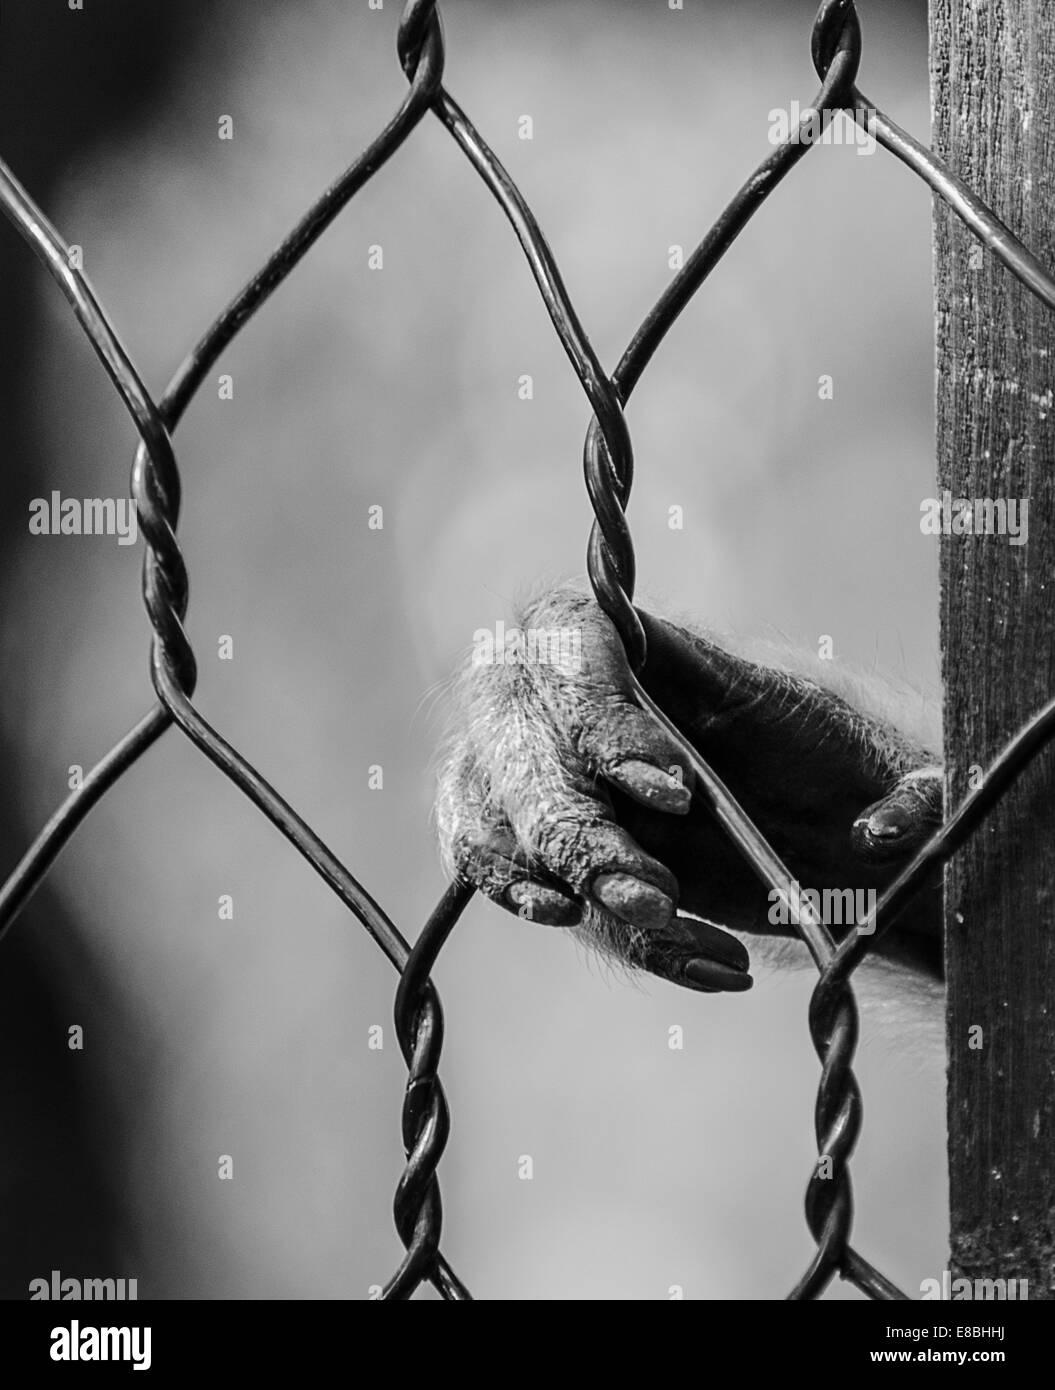 Monkey Hand Behind the Cage Zoo Prisoner Sad Stock Photo